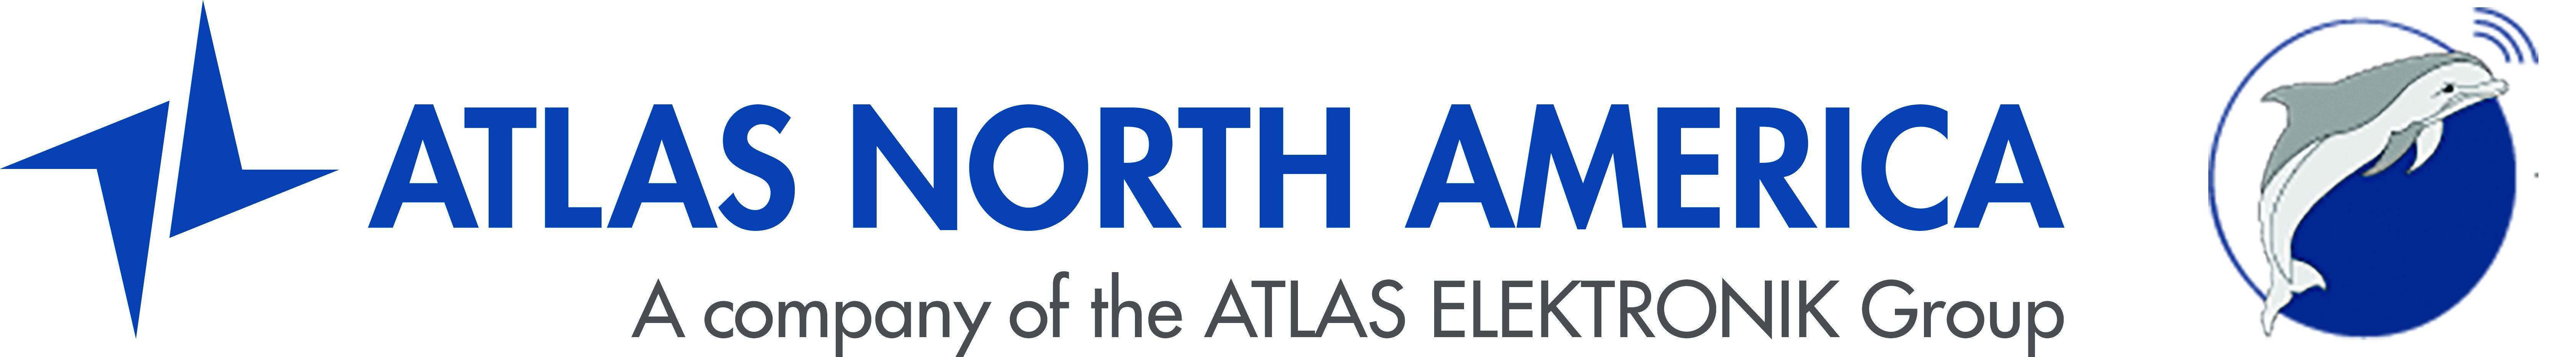 Atlas North America